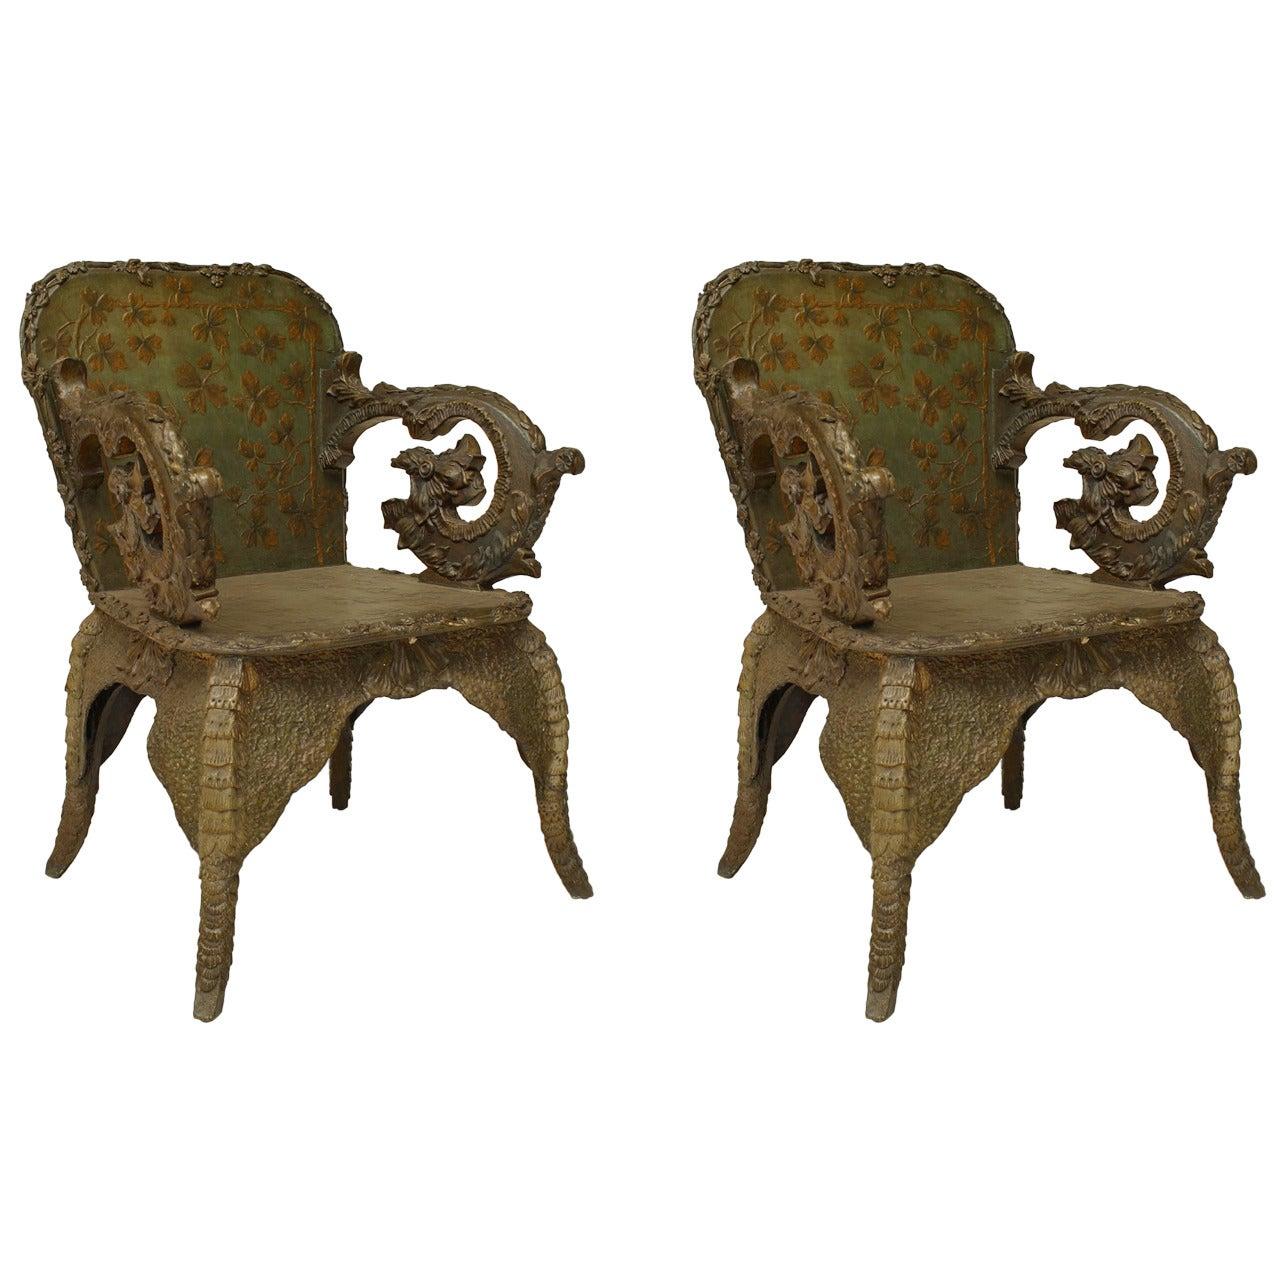 2 Similar Continental Austrian Floral Arm Chairs